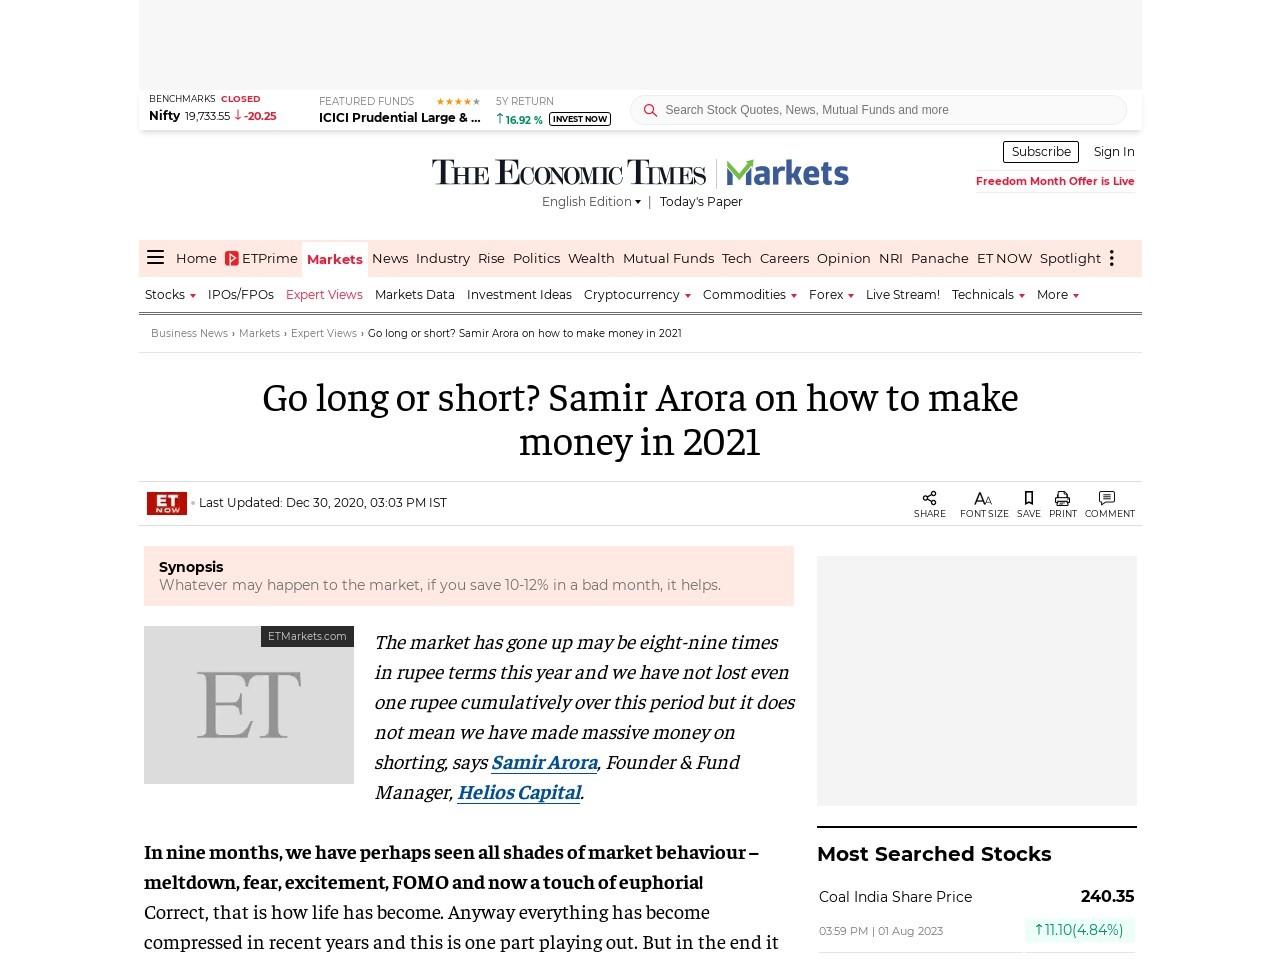 Go long or short? Samir Arora on how to make money in 2021 – Economic Times